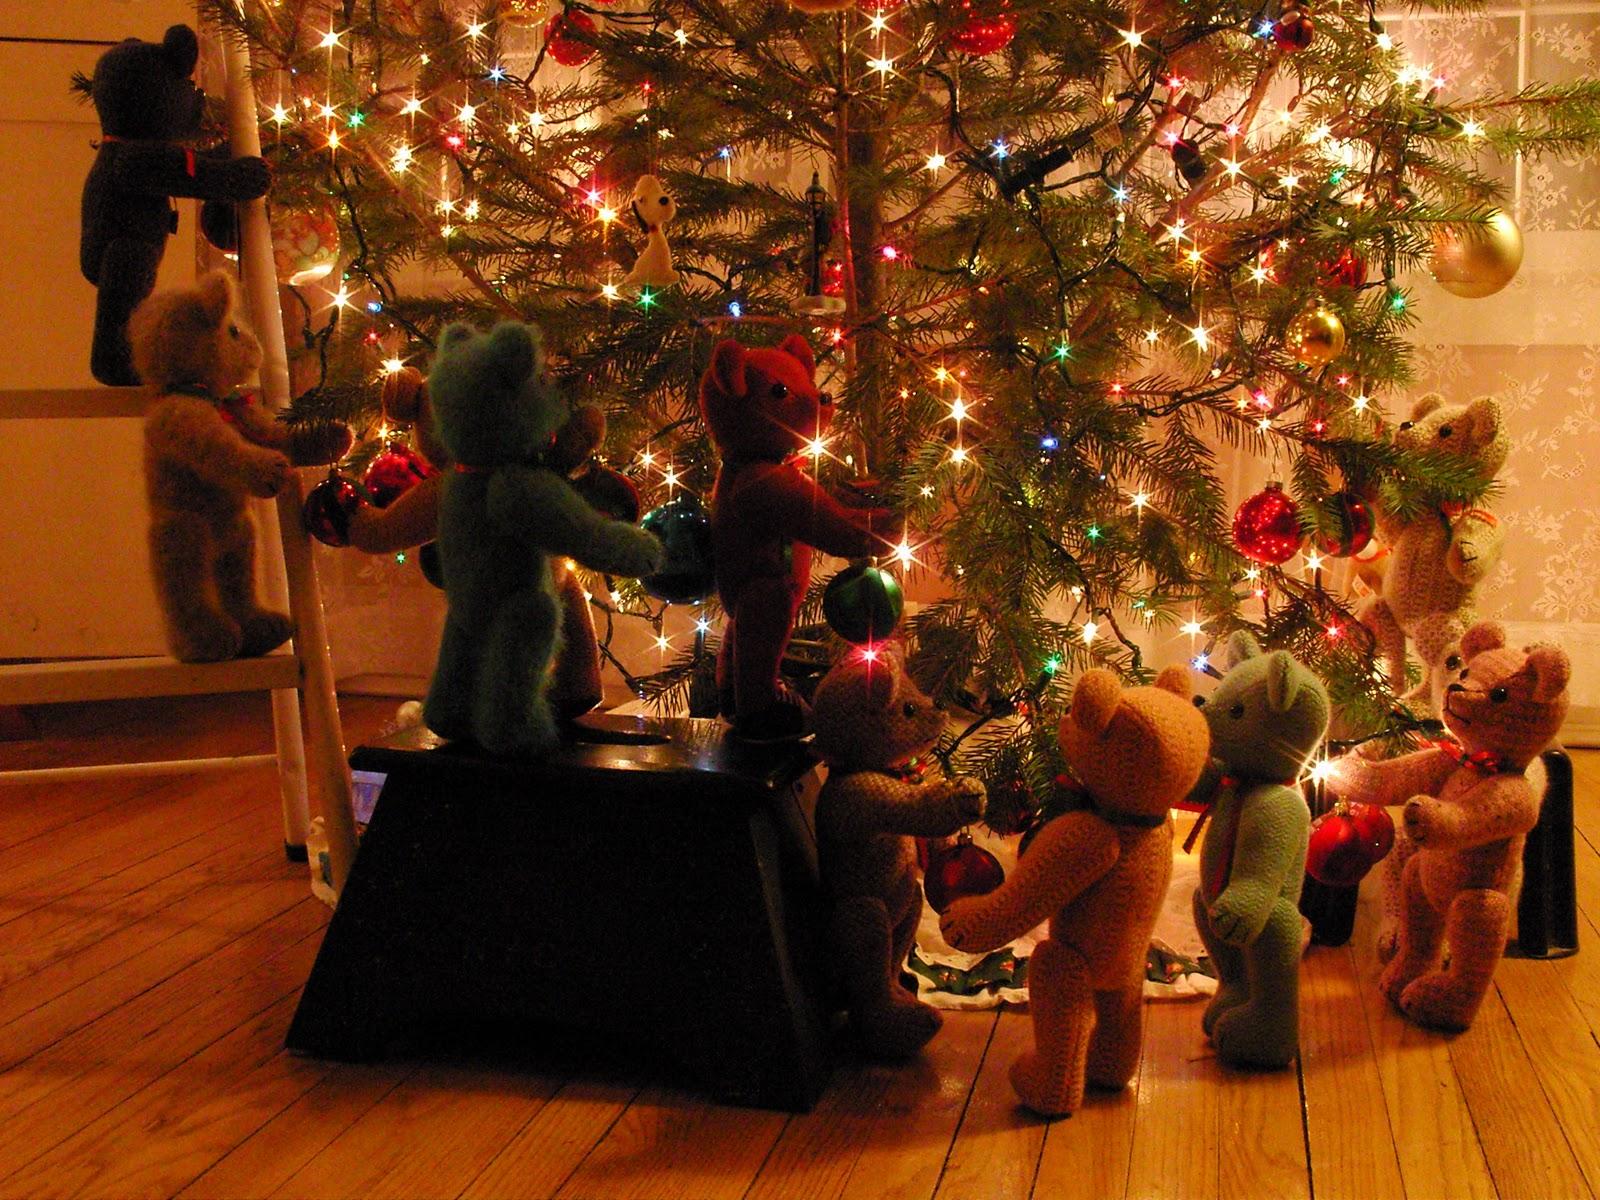 Christmas Tree Decorated With Teddy Bears Teddy Bears Help Decorate The